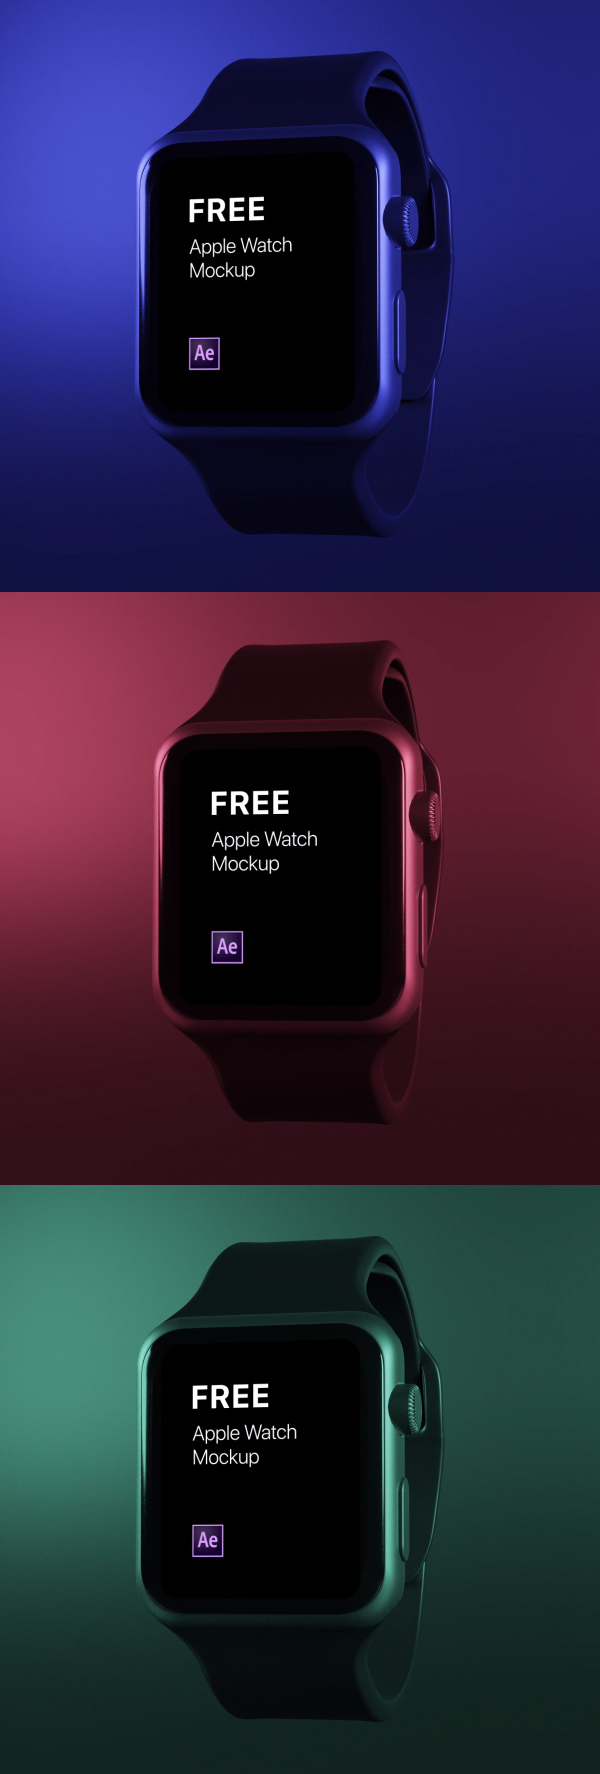 Free Apple Watch Animated Mockup